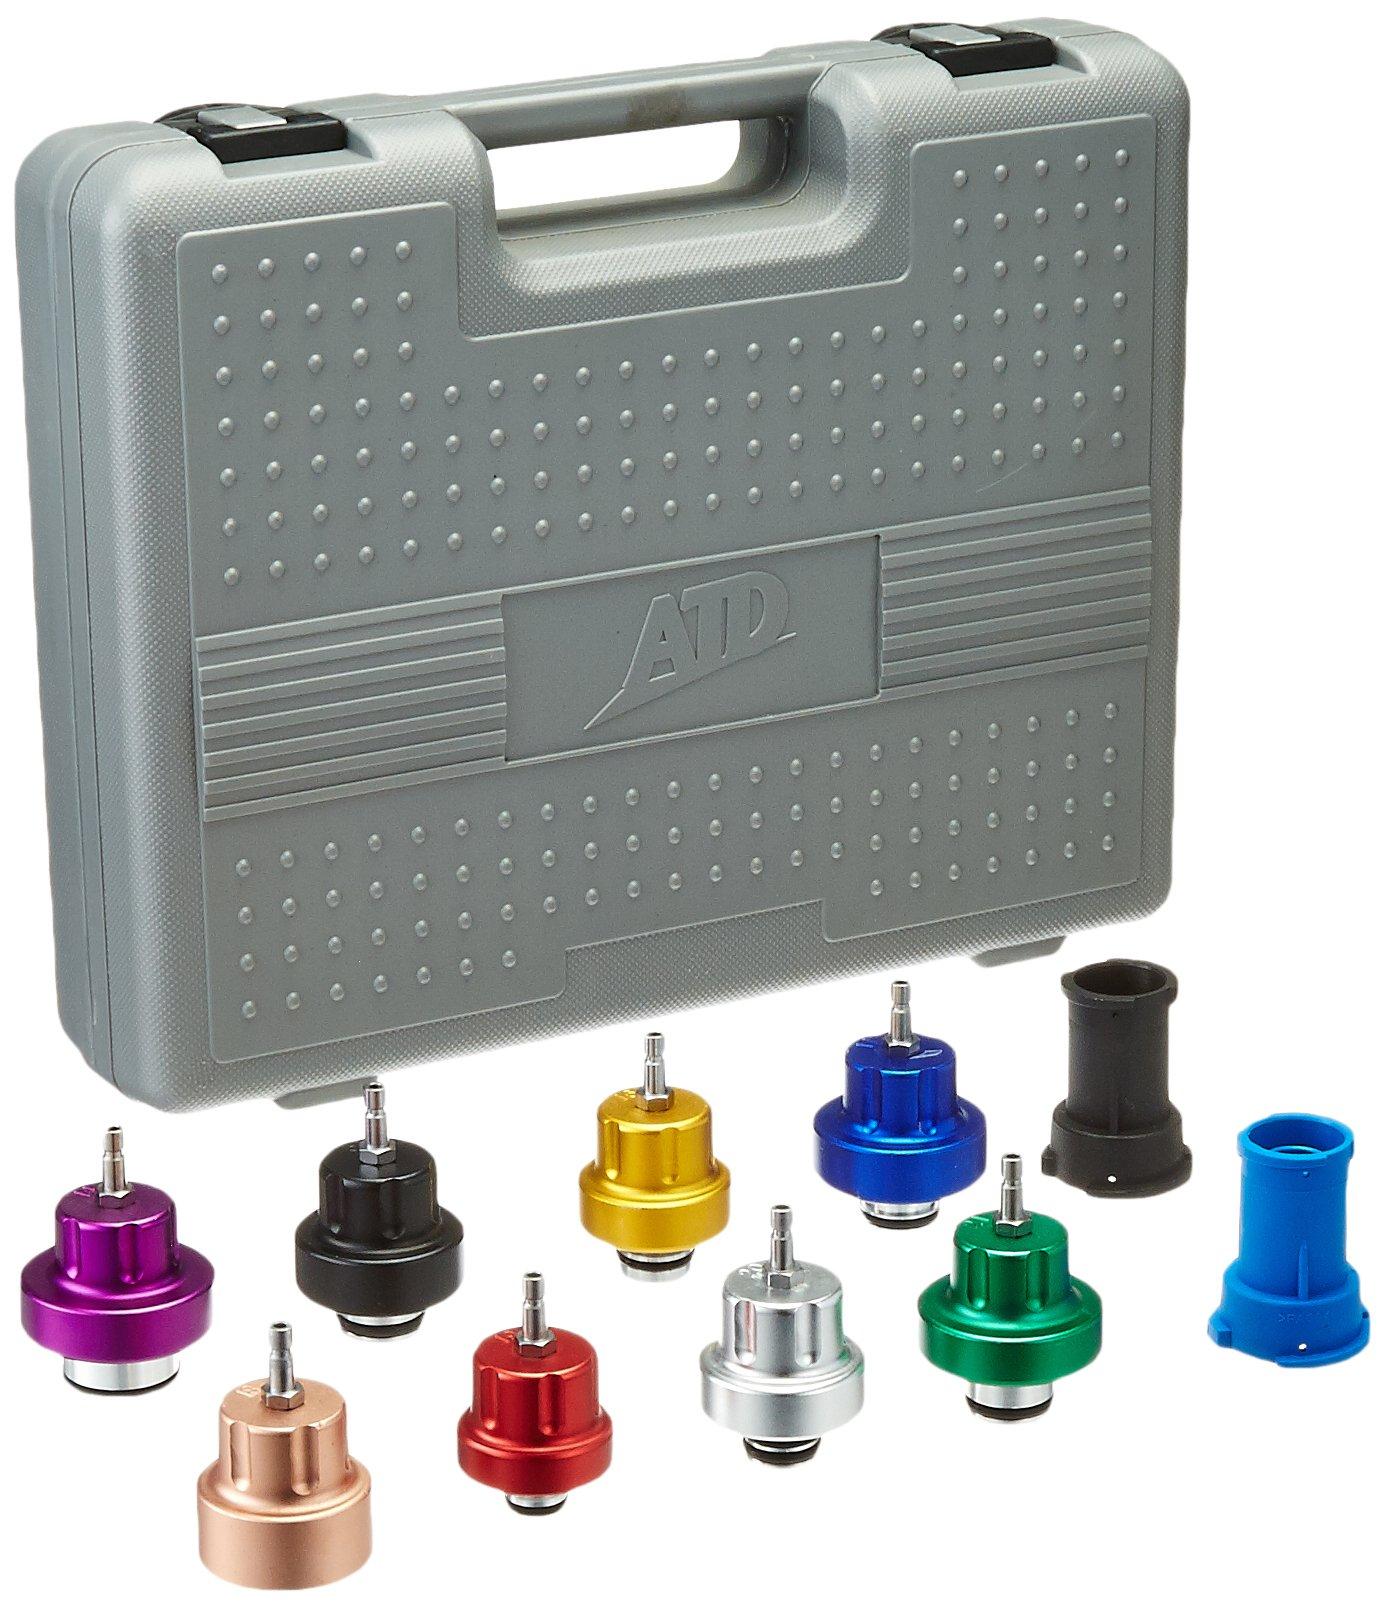 ATD Tools 3305 10-Piece Radiator Pressure Tester Update Kit